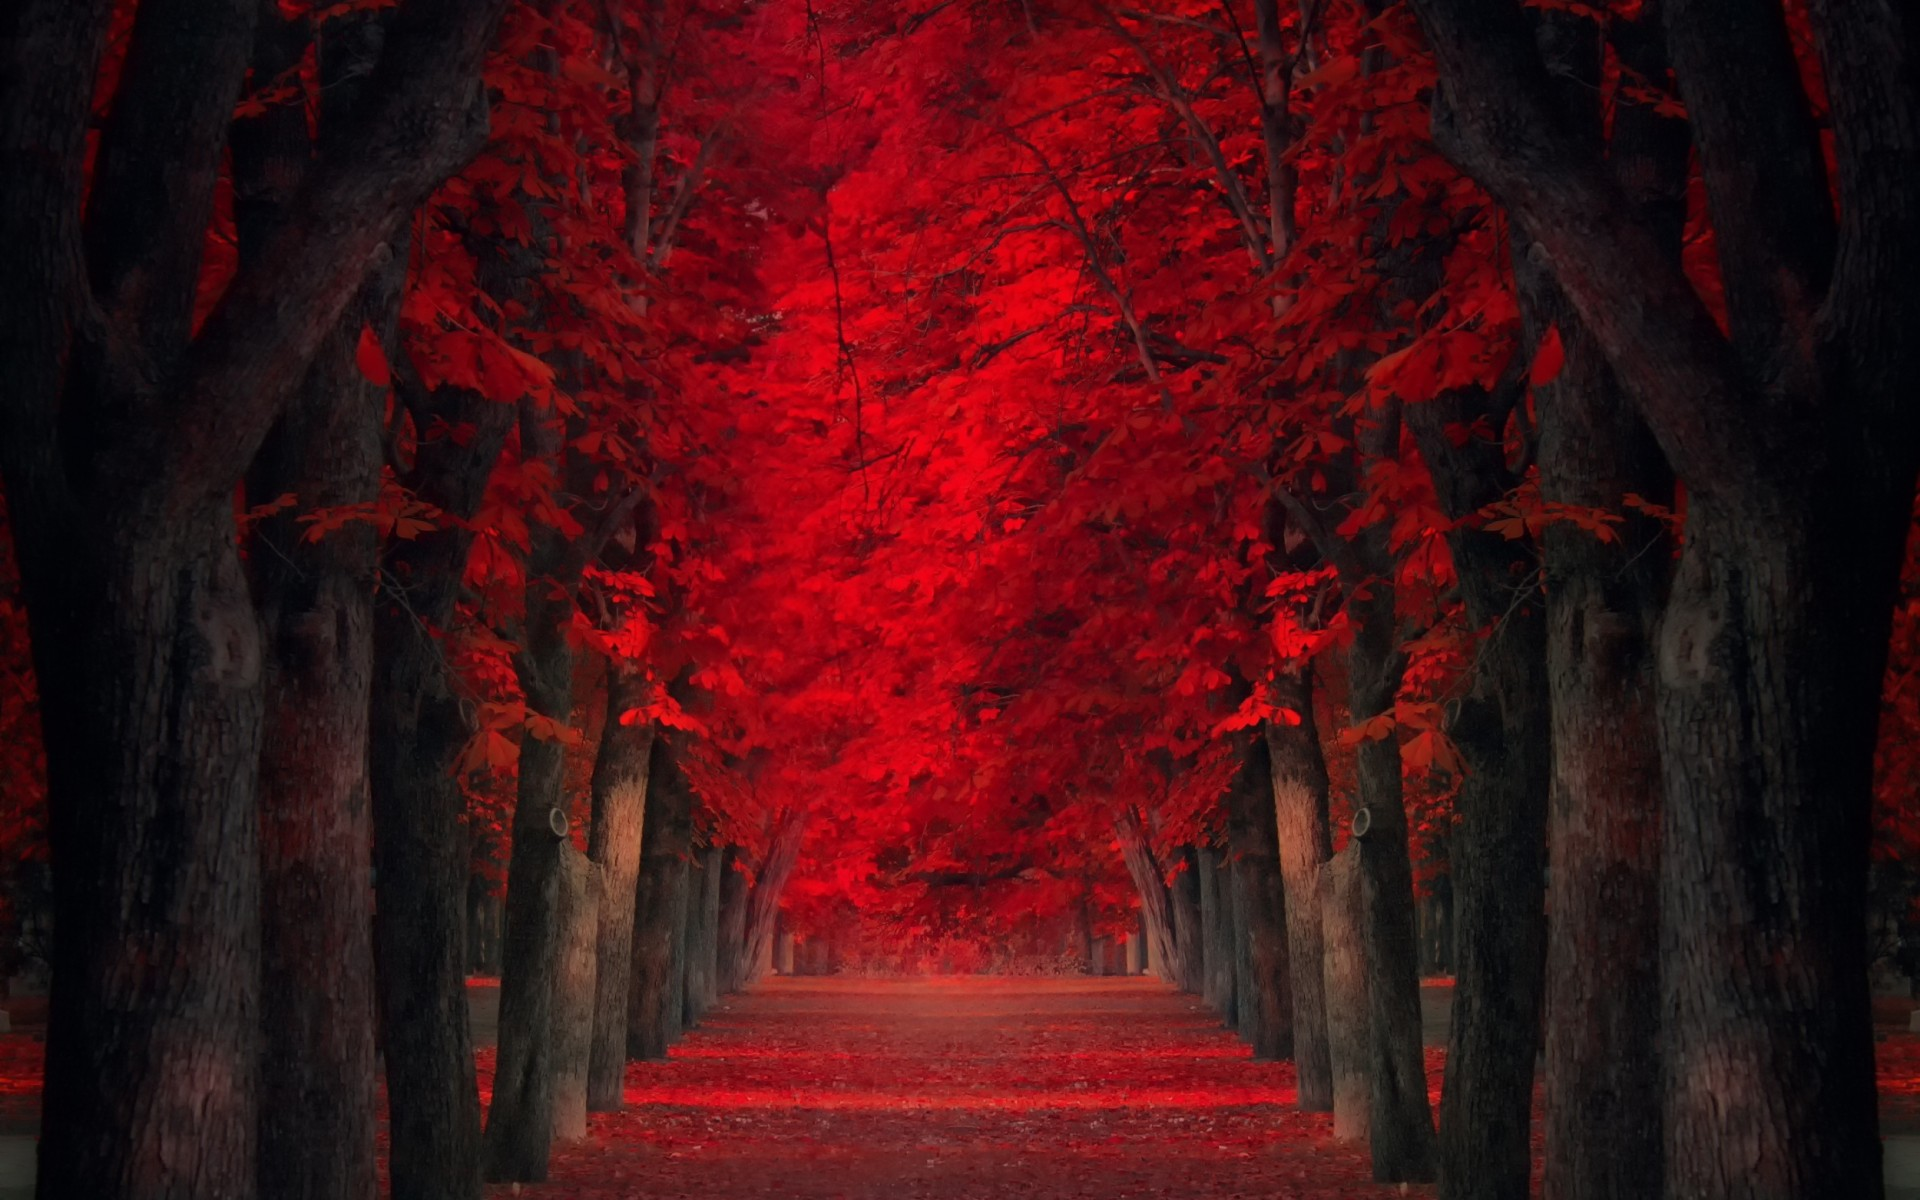 Falling Leaves Hd Live Wallpaper Desktop Wallpaper Foglie D Autunno